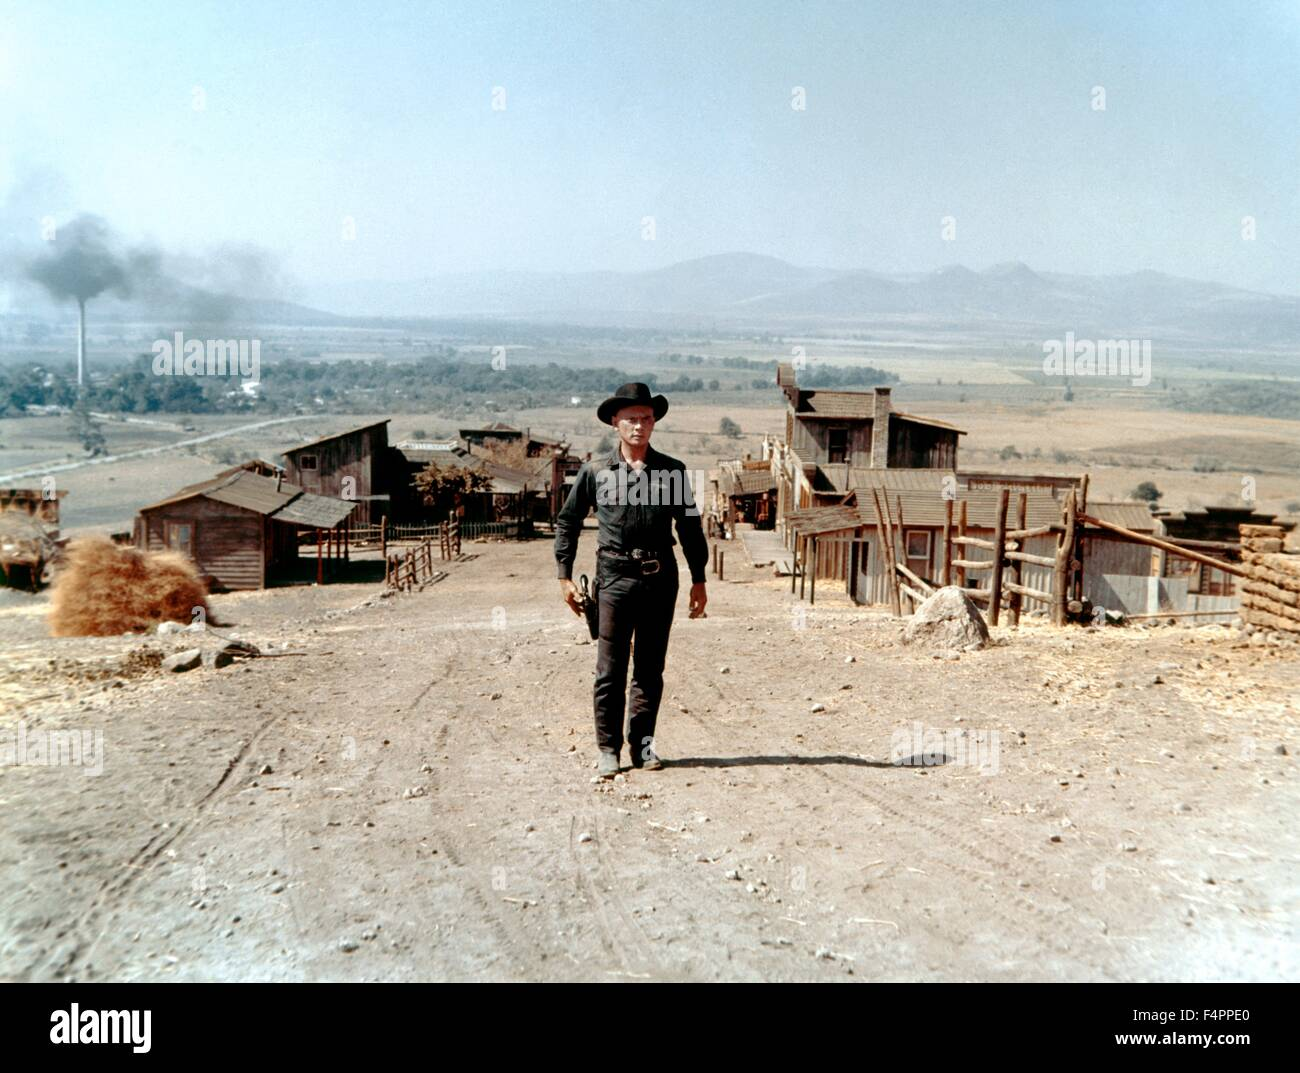 Yul Brynner / I magnifici sette / 1960 diretto da John Sturges [United Artists] Immagini Stock